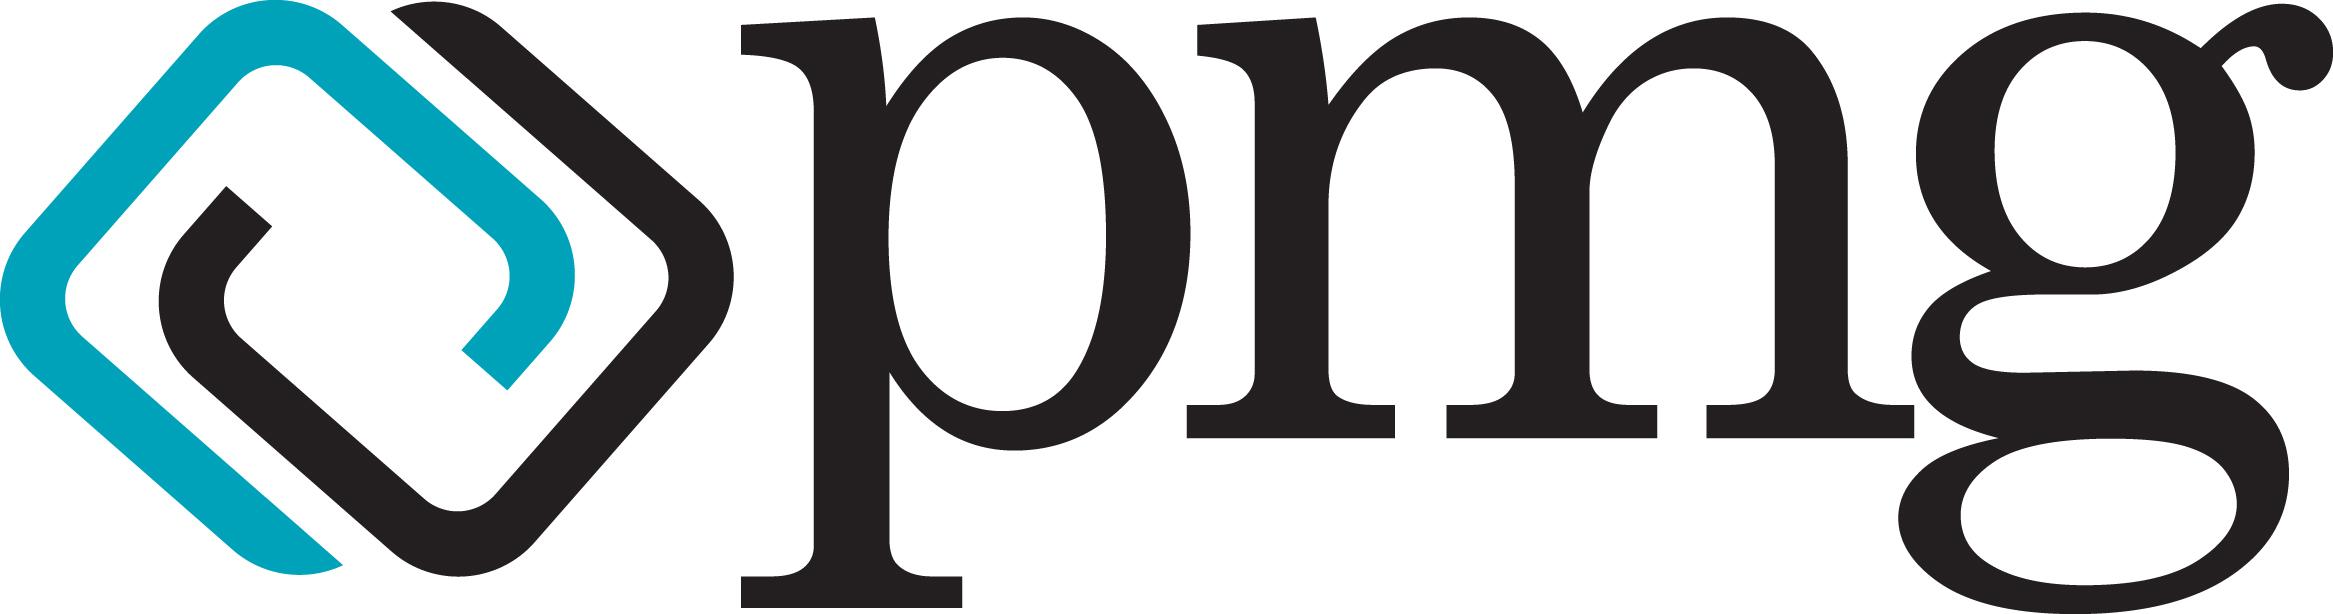 Pmg Ranks 61 On 2014 Inc 500 List 5 Among Advertising